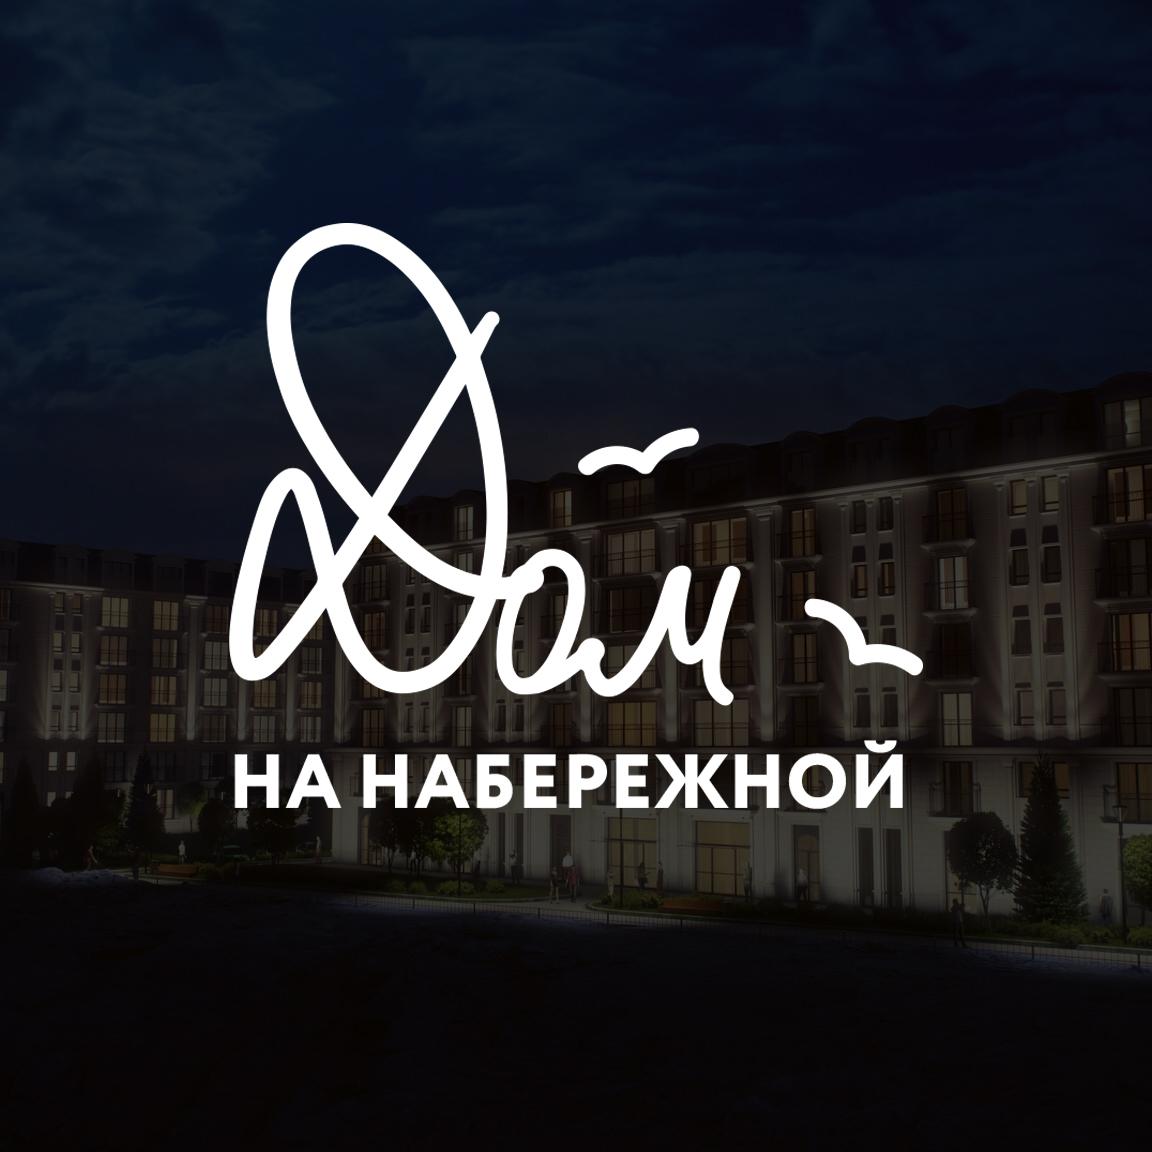 РАЗРАБОТКА логотипа для ЖИЛОГО КОМПЛЕКСА премиум В АНАПЕ.  фото f_4515de7f1d25133b.jpg